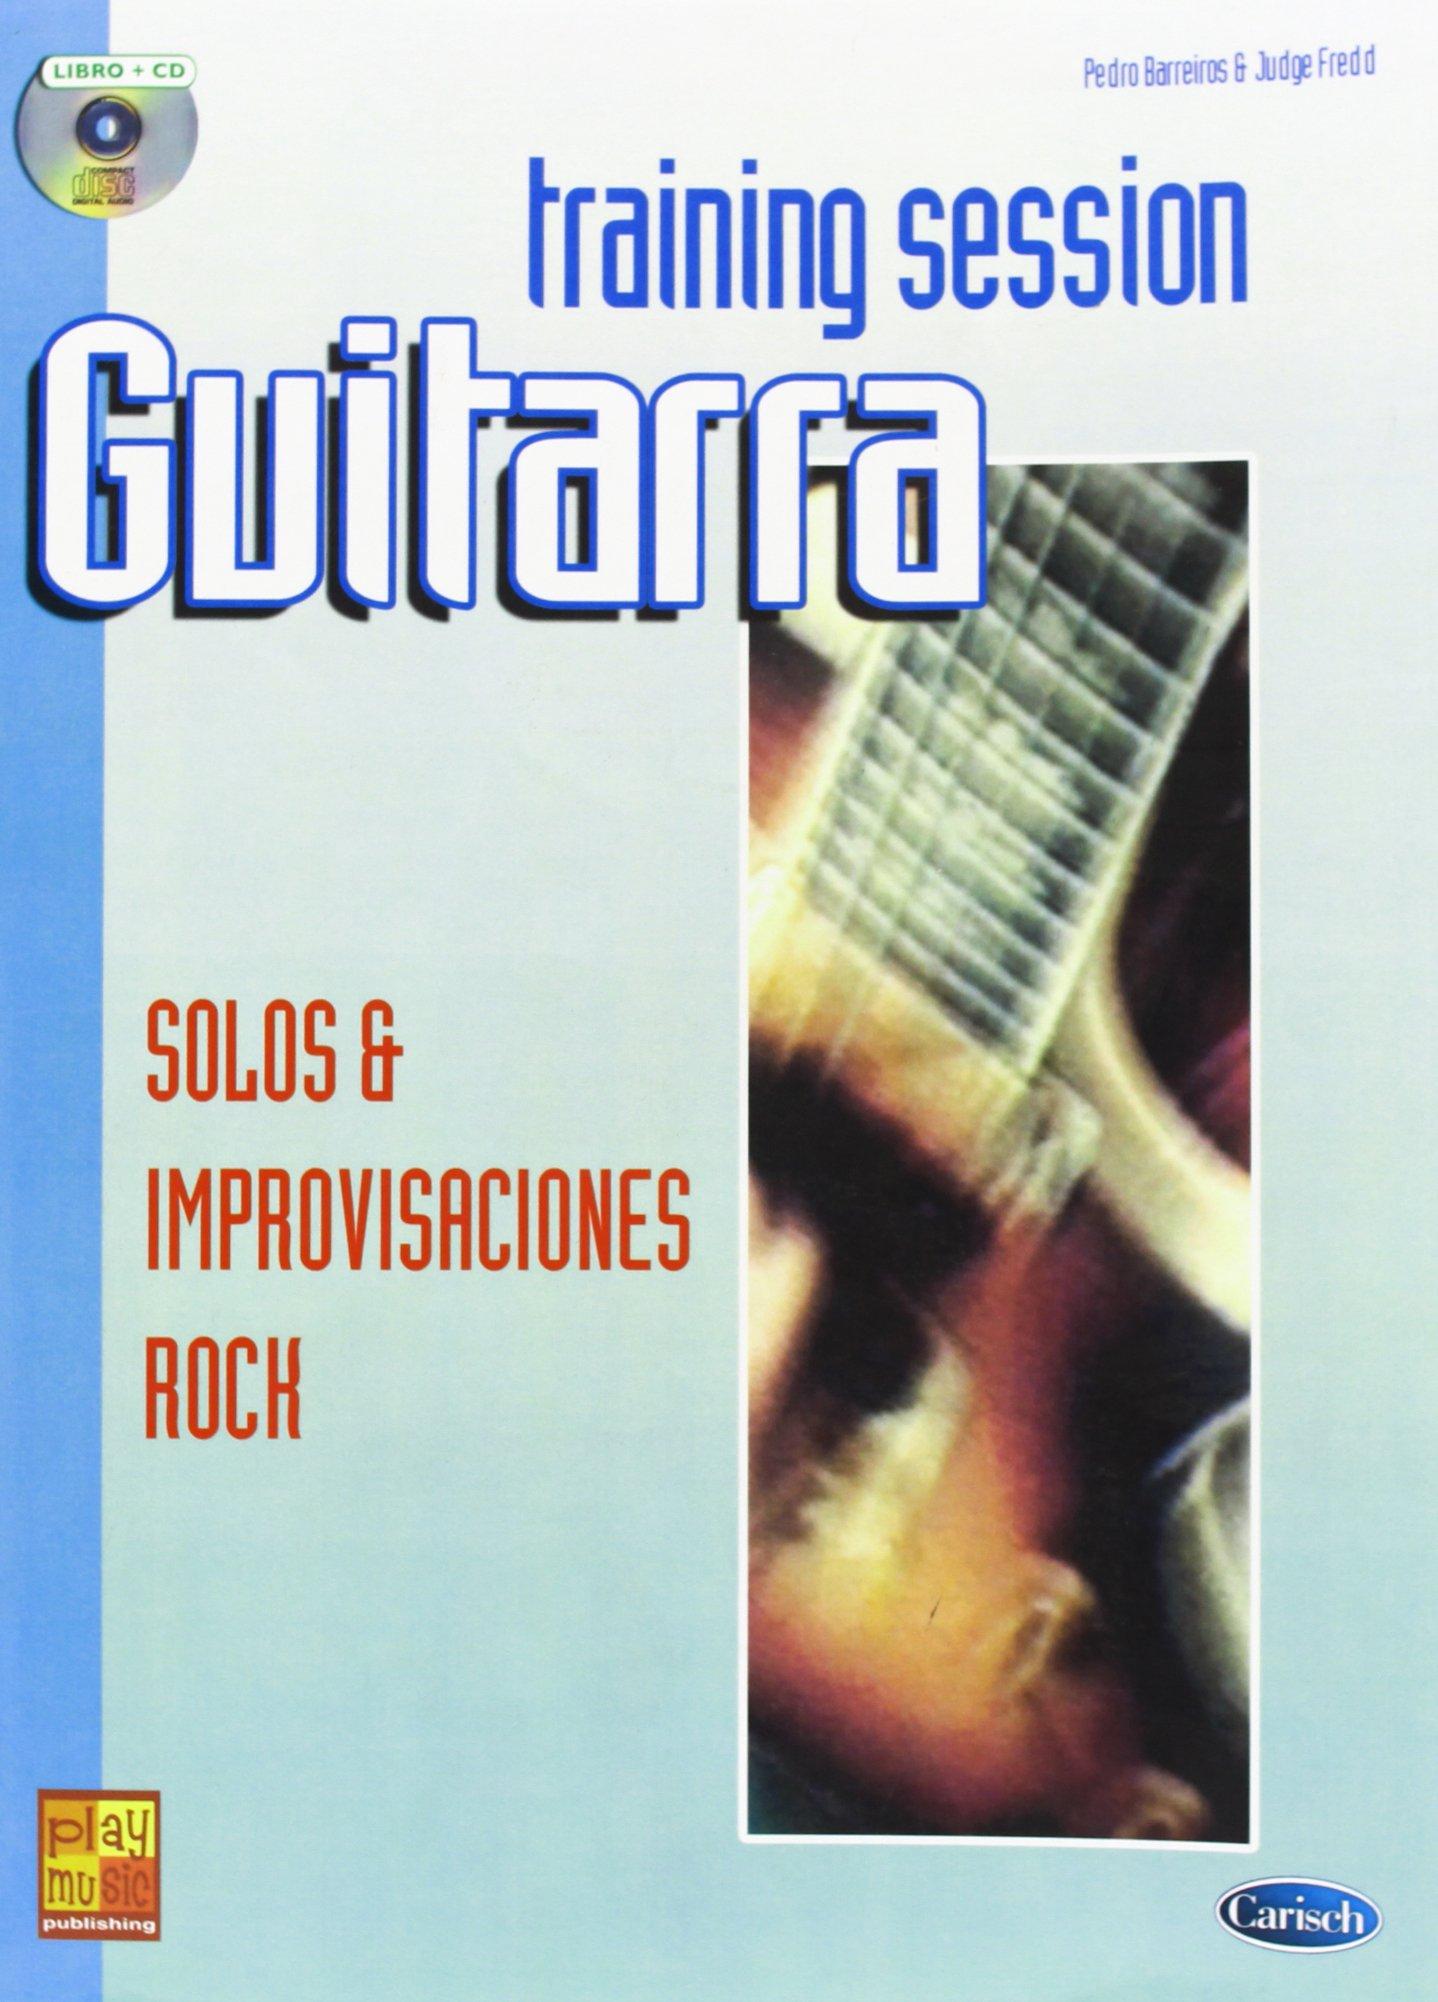 Guitar Training Session: Solos & Improvisaciones Rock Play Music ...